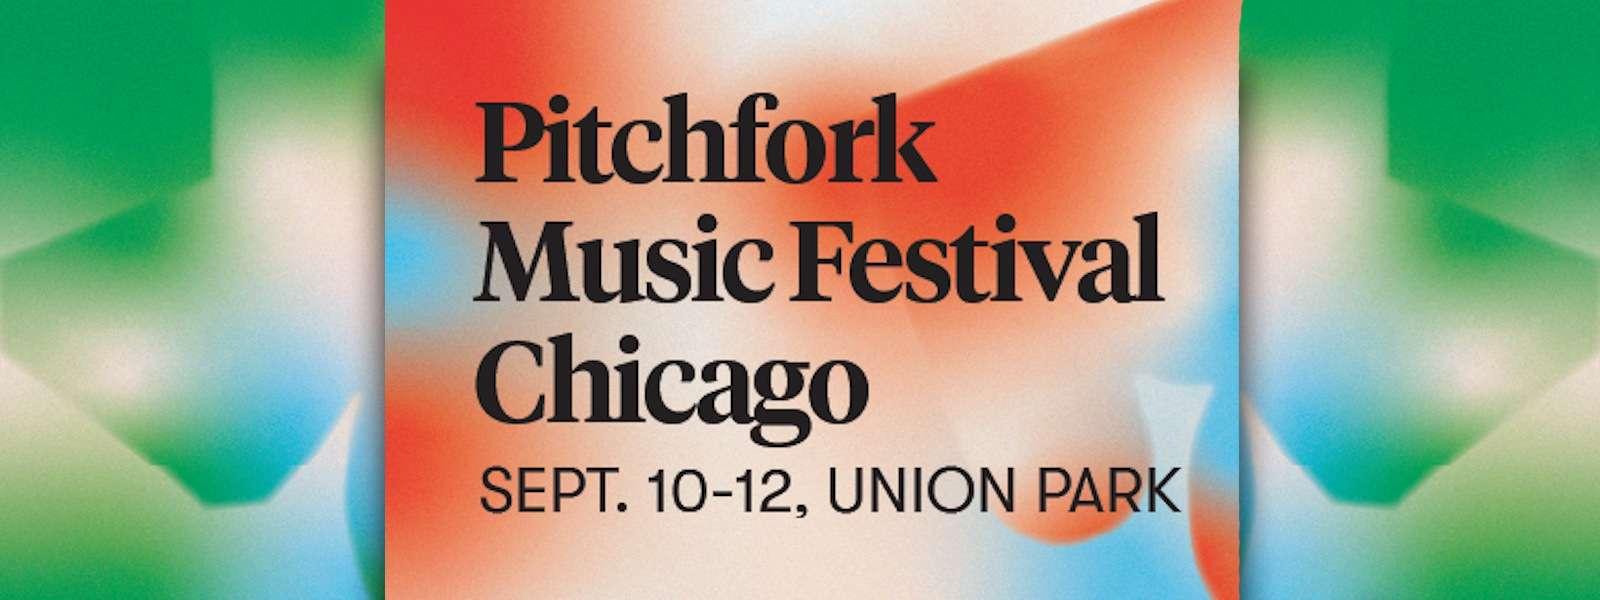 PITCHFORK MUSIC FESTIVAL Announce New 2021 Dates